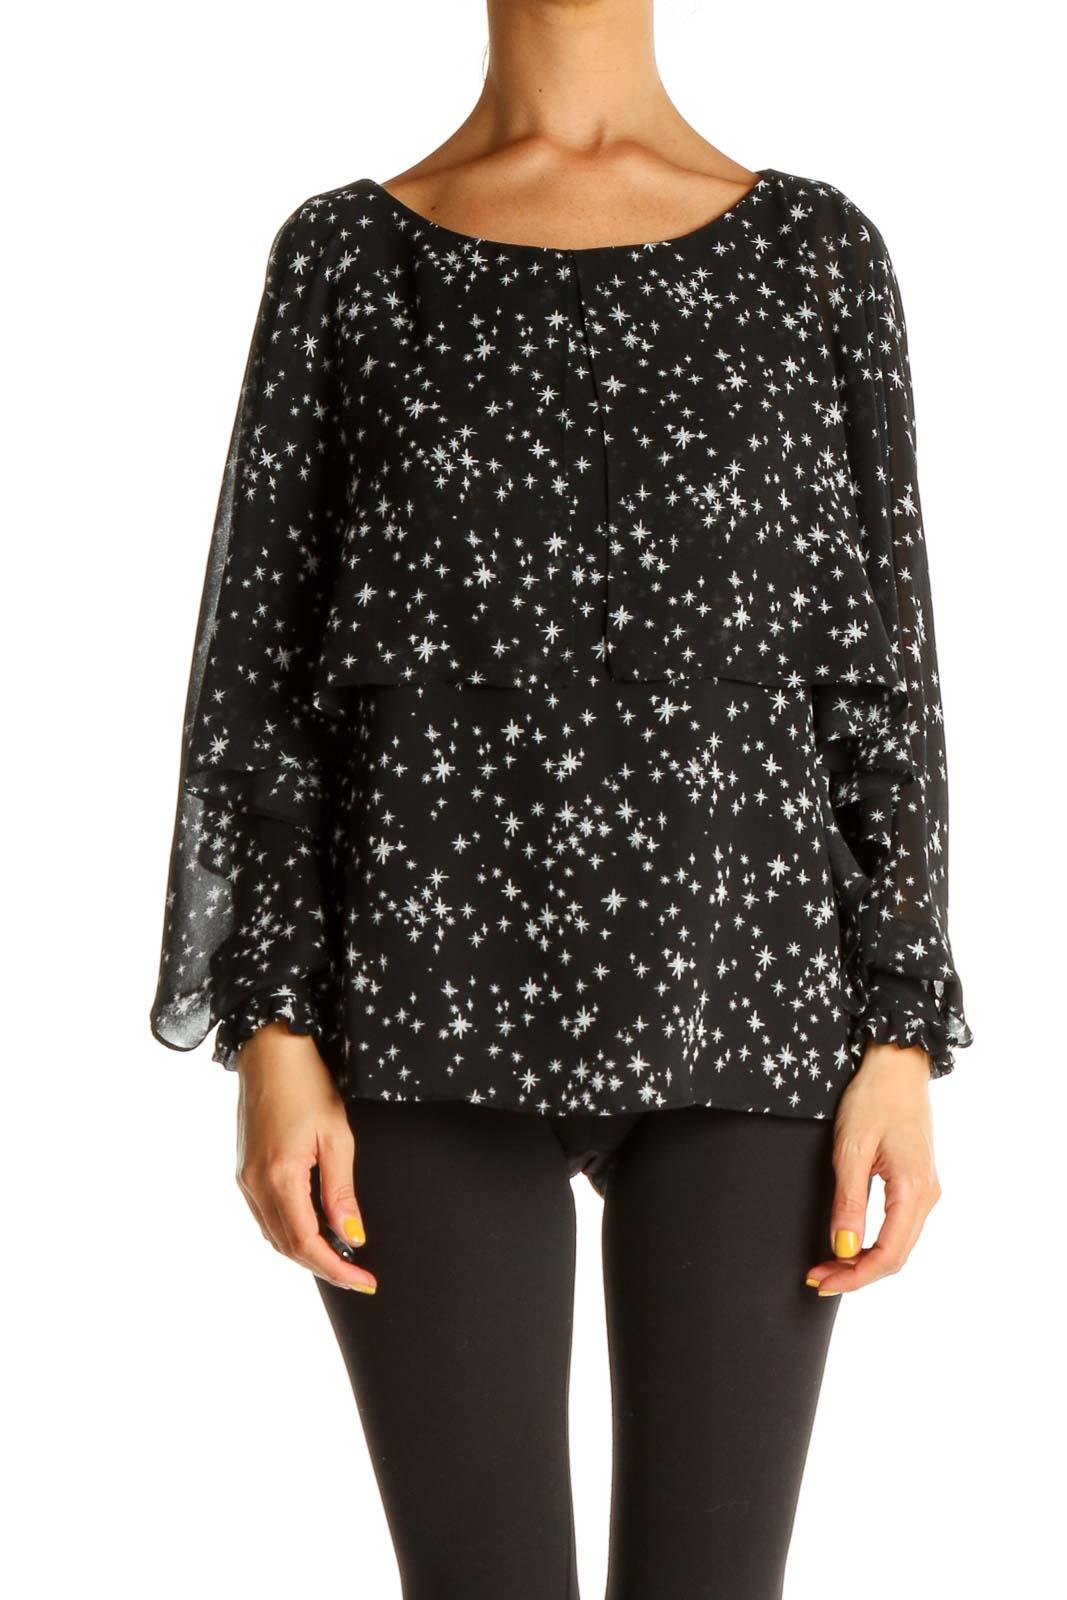 Black Sparkle Polka Dot All Day Wear Blouse Front